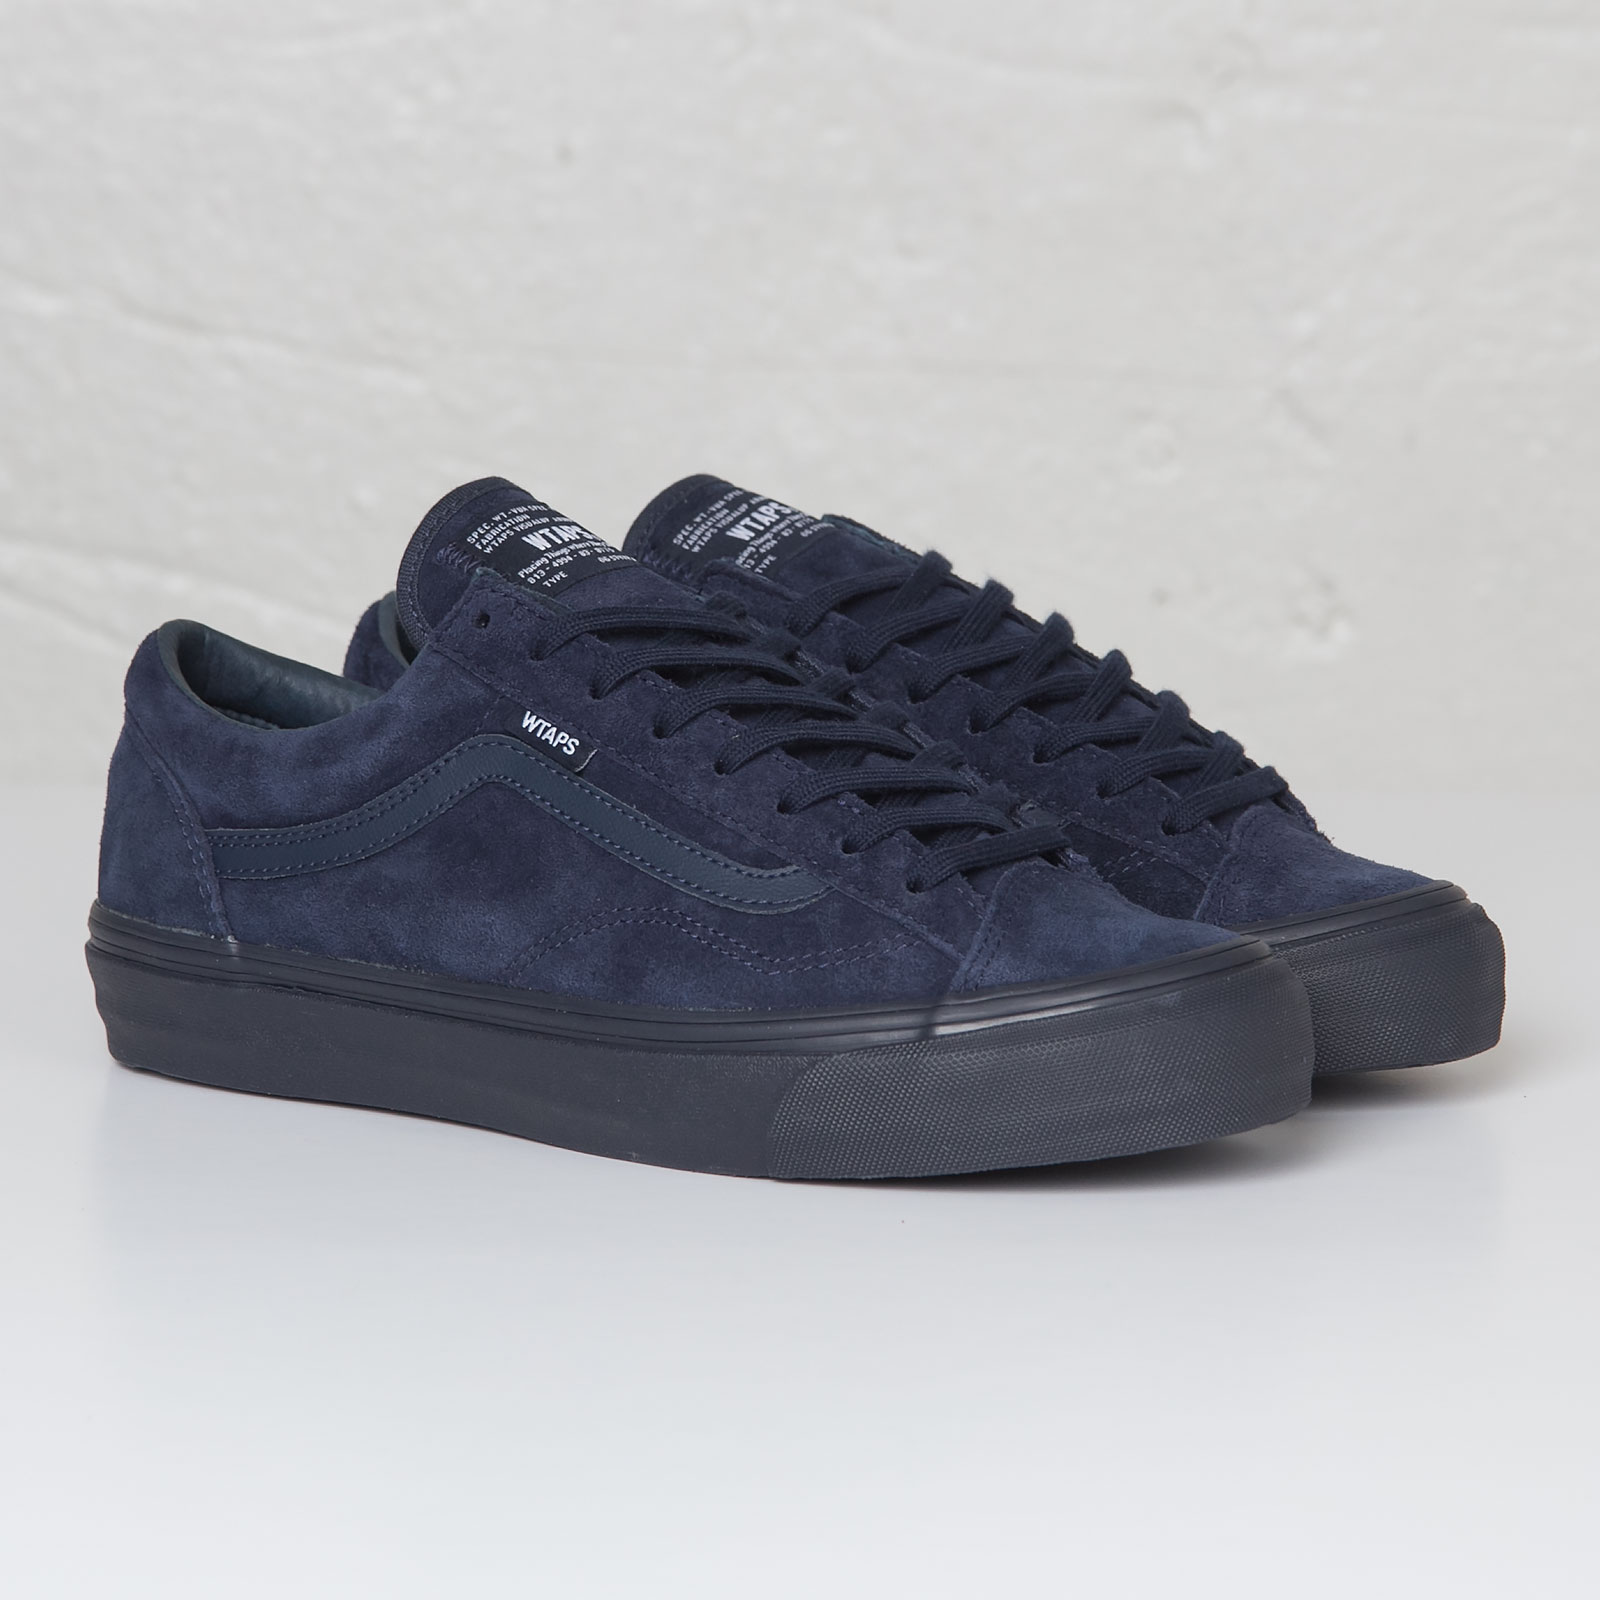 LxwtapsVsf5gw8 36 SneakersnstuffSneakers Style Vans Og WEDHI29